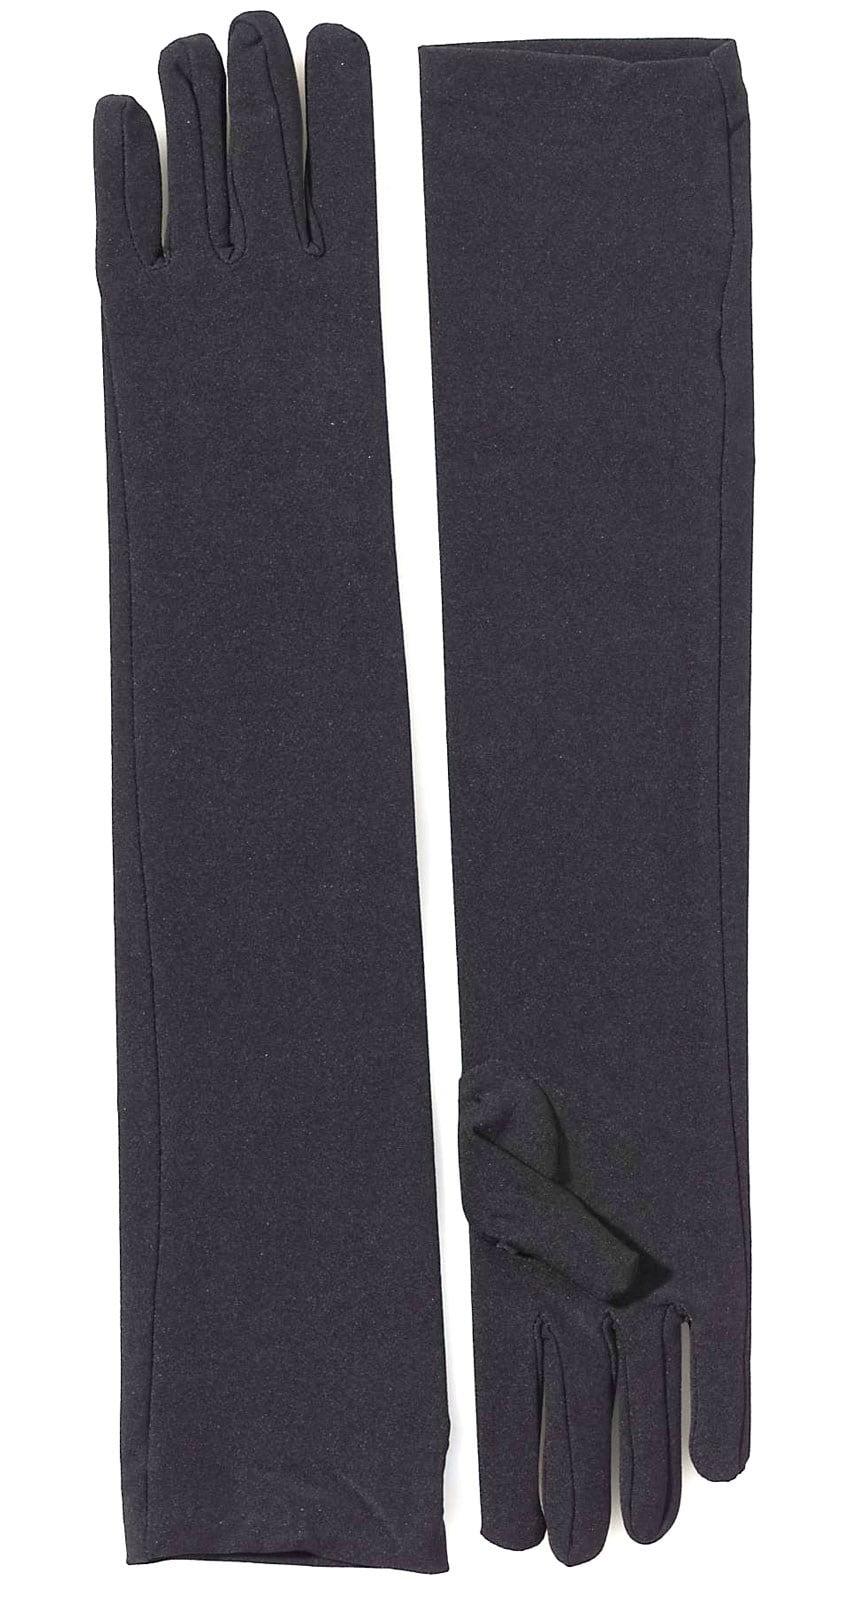 1ee90d1381593 Classic/Everyday - Black Long Nylon Adult Gloves - Walmart.com